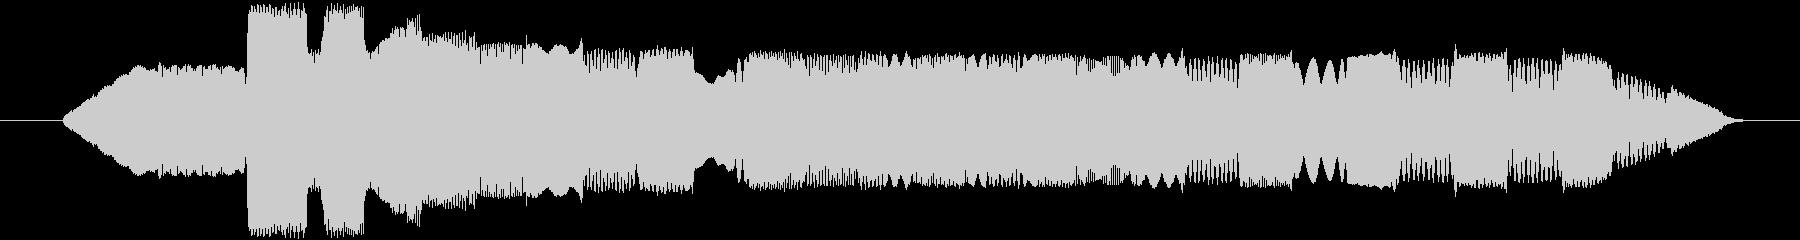 FX Telegraphic Sy...の未再生の波形